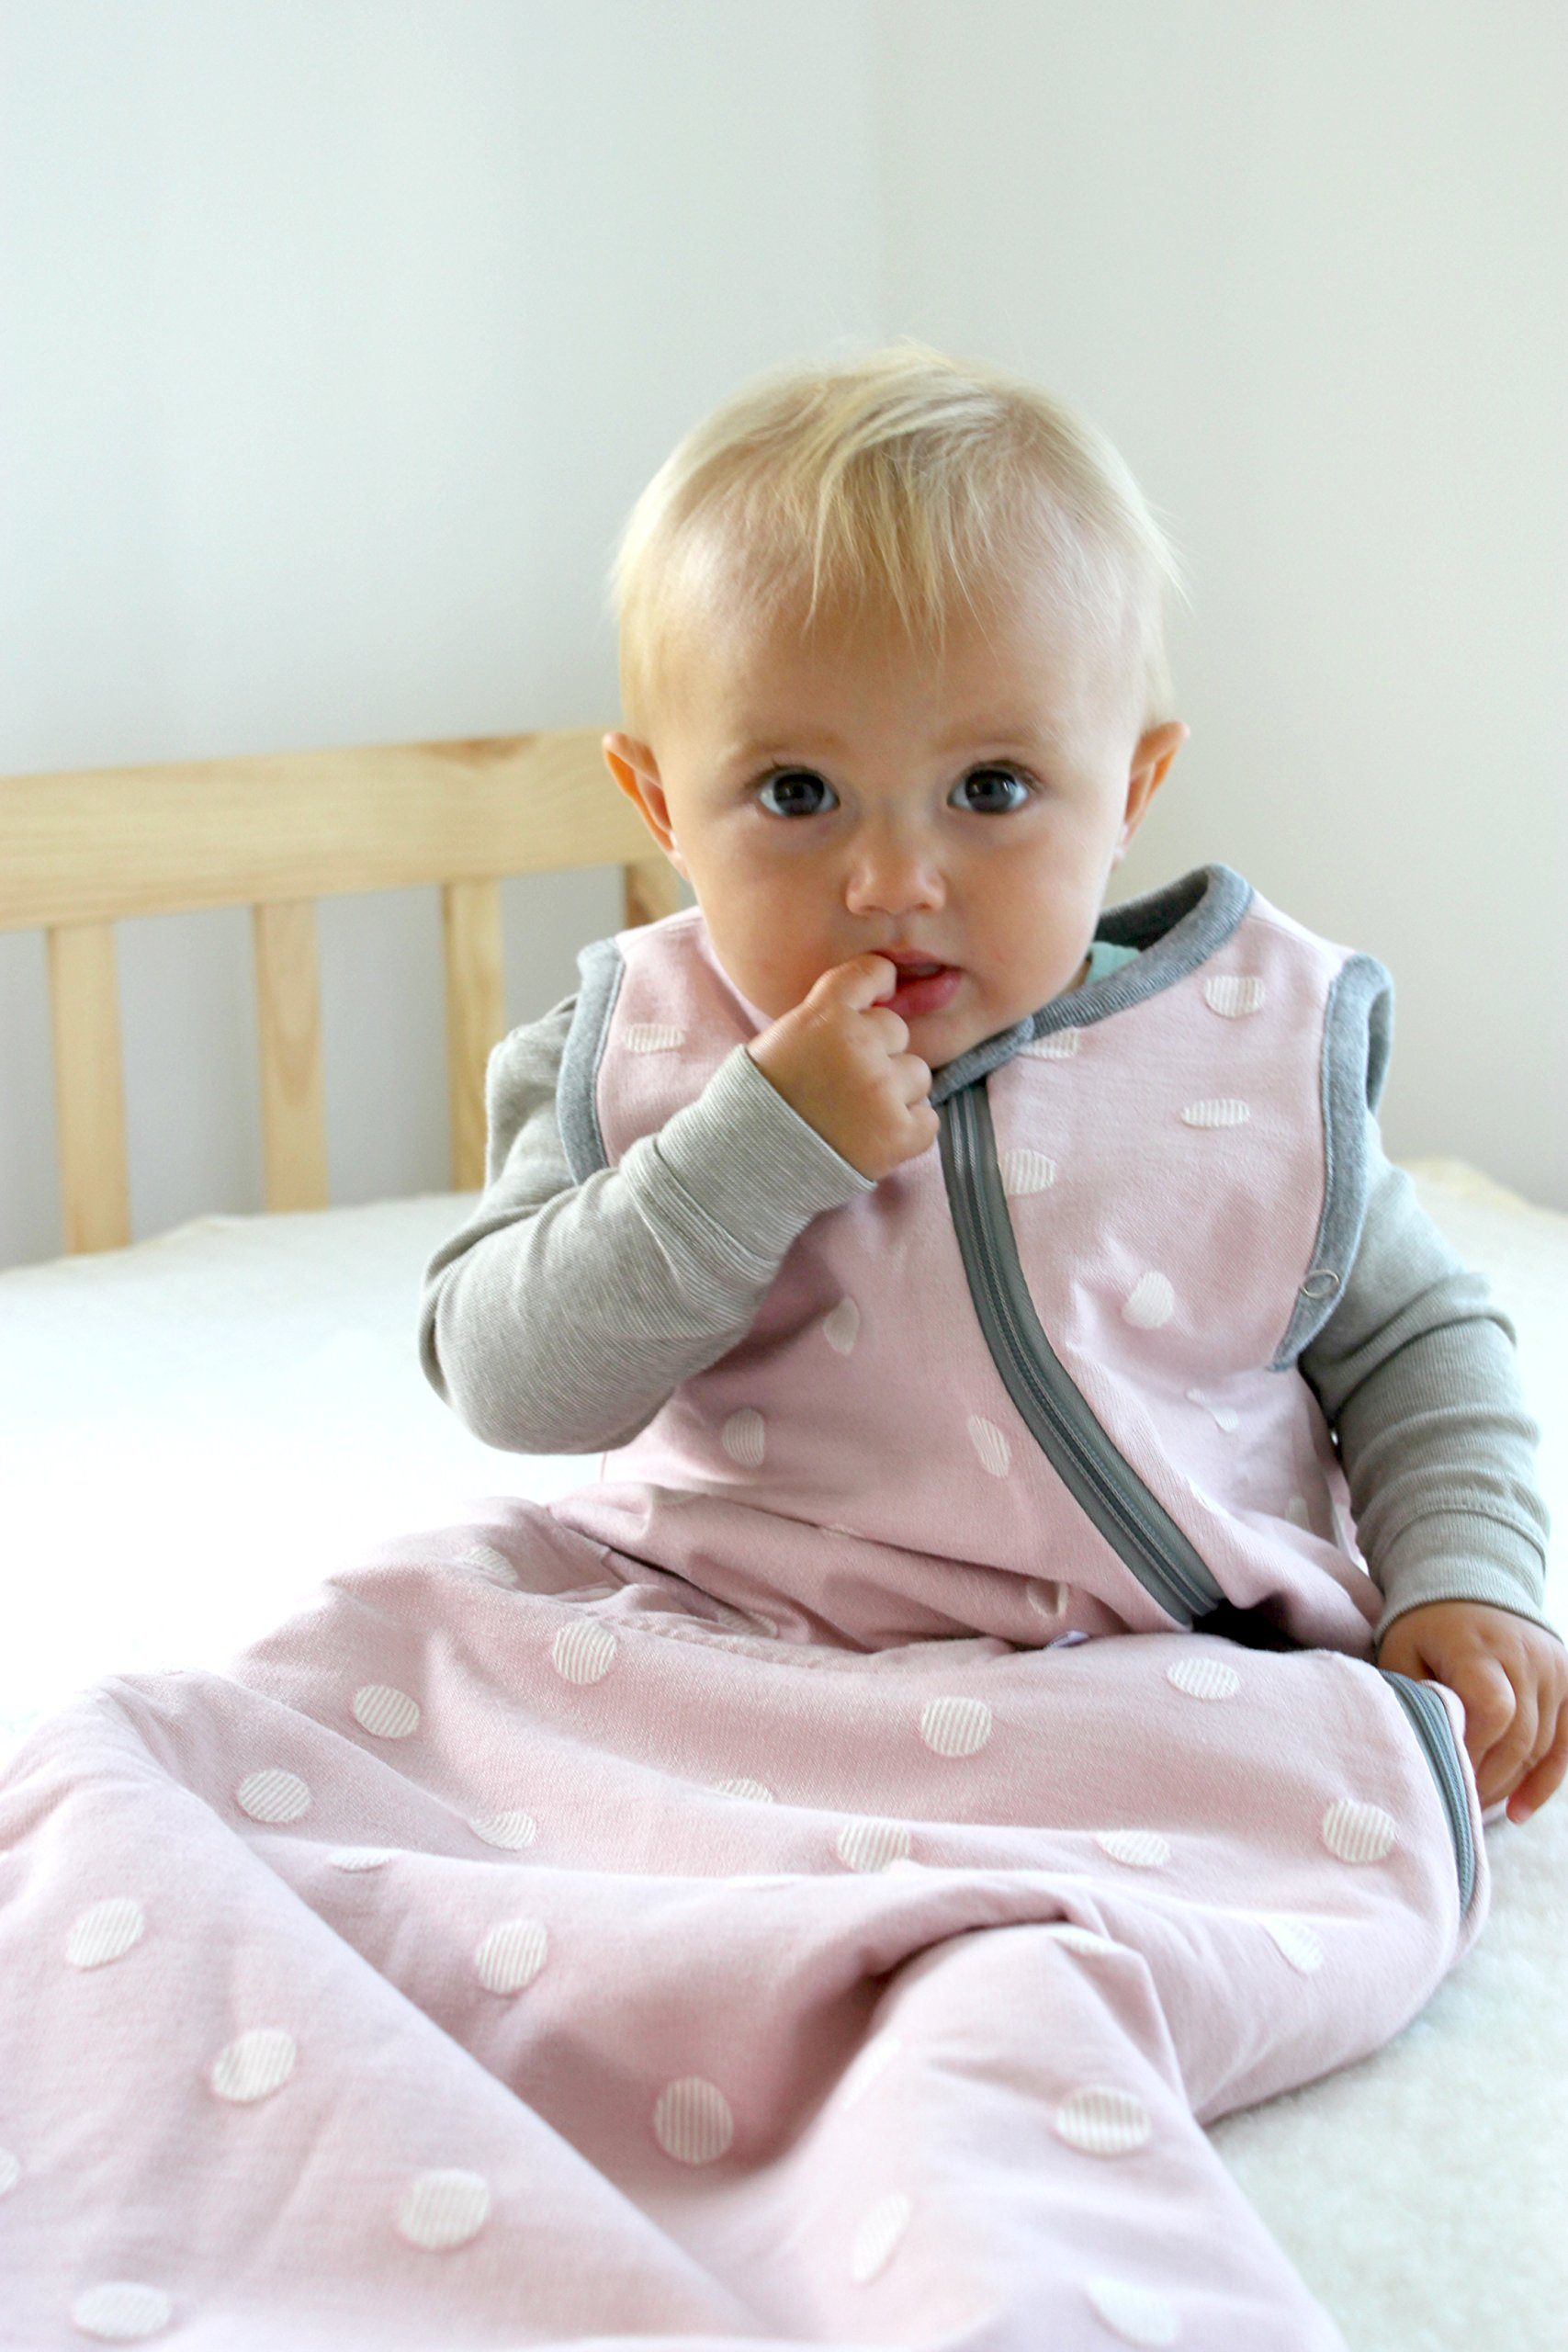 WINTER DUVET MERINO Toddler Sleeping Bag / Sleep Bag, 2-4 yrs old, BLOOM